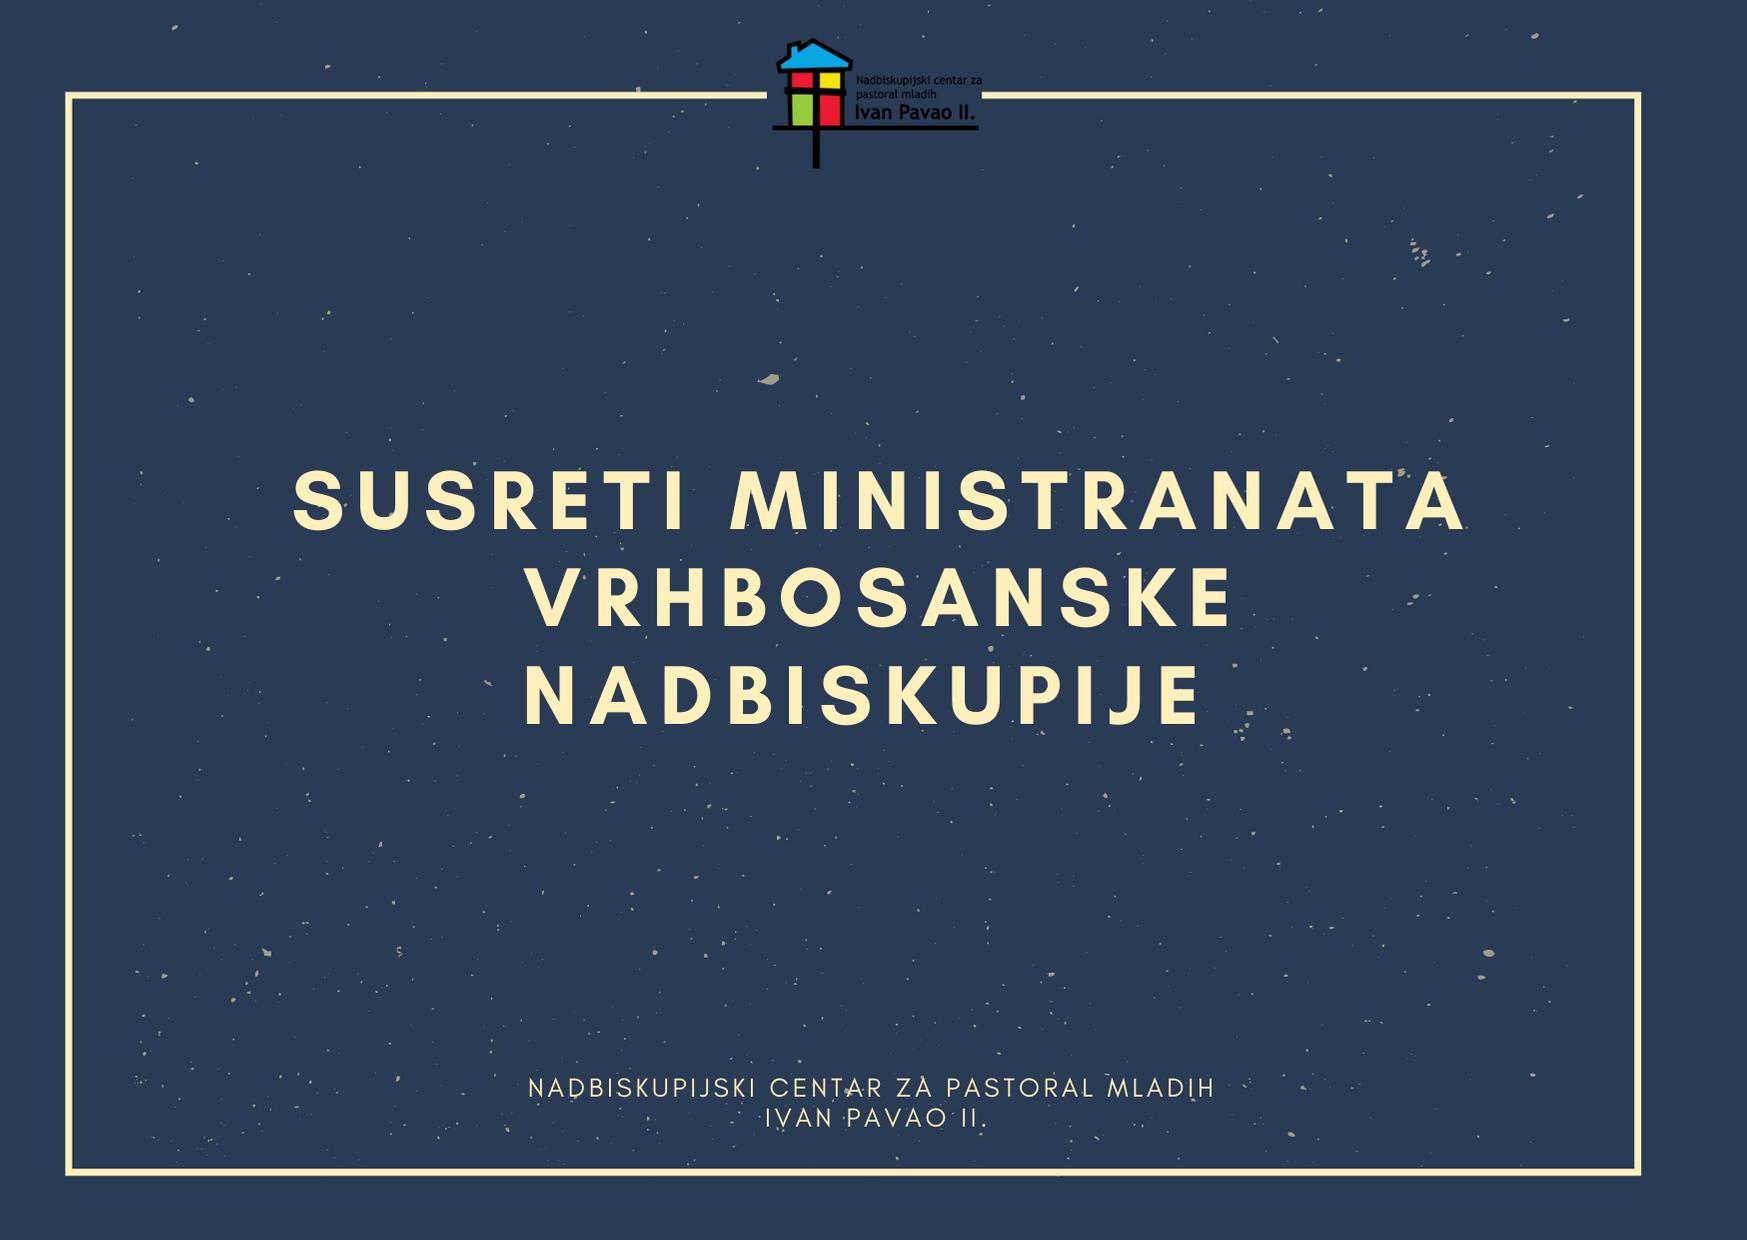 Susreti ministranata Vrhbosanske nadbiskupije